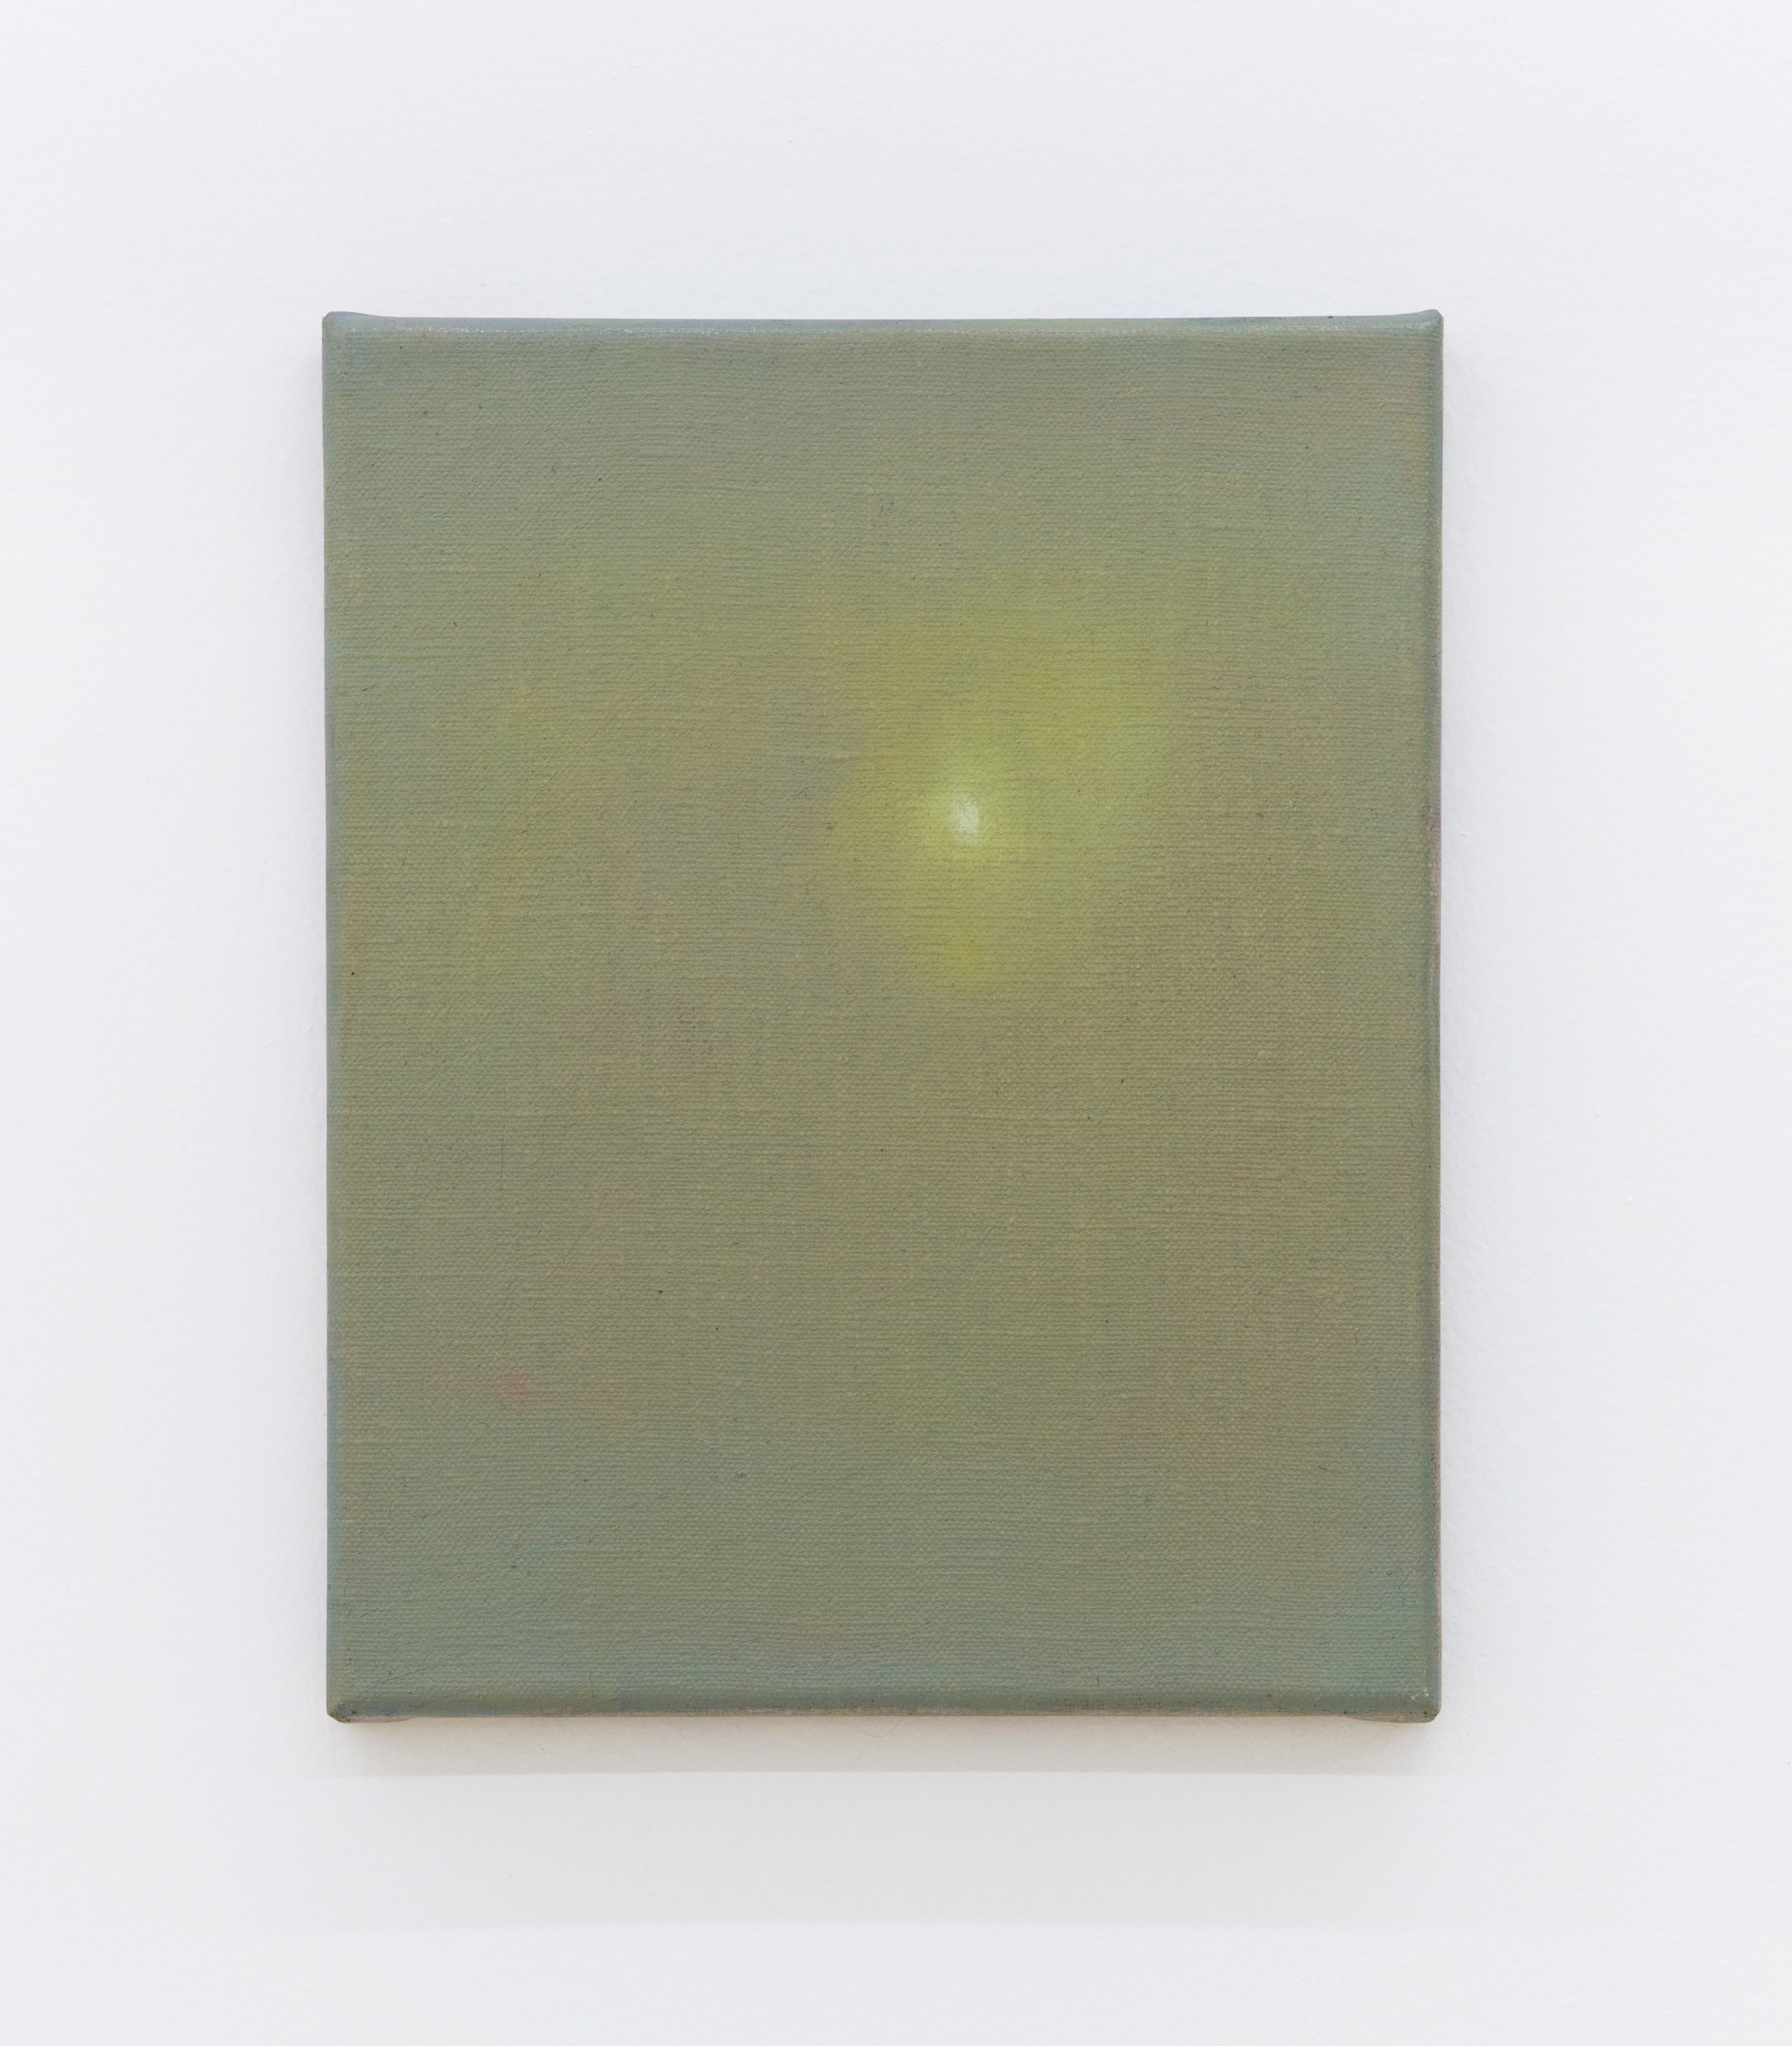 Matthew Sepielli   Little Light,  2019 Oil on linen 10 x 8 inches